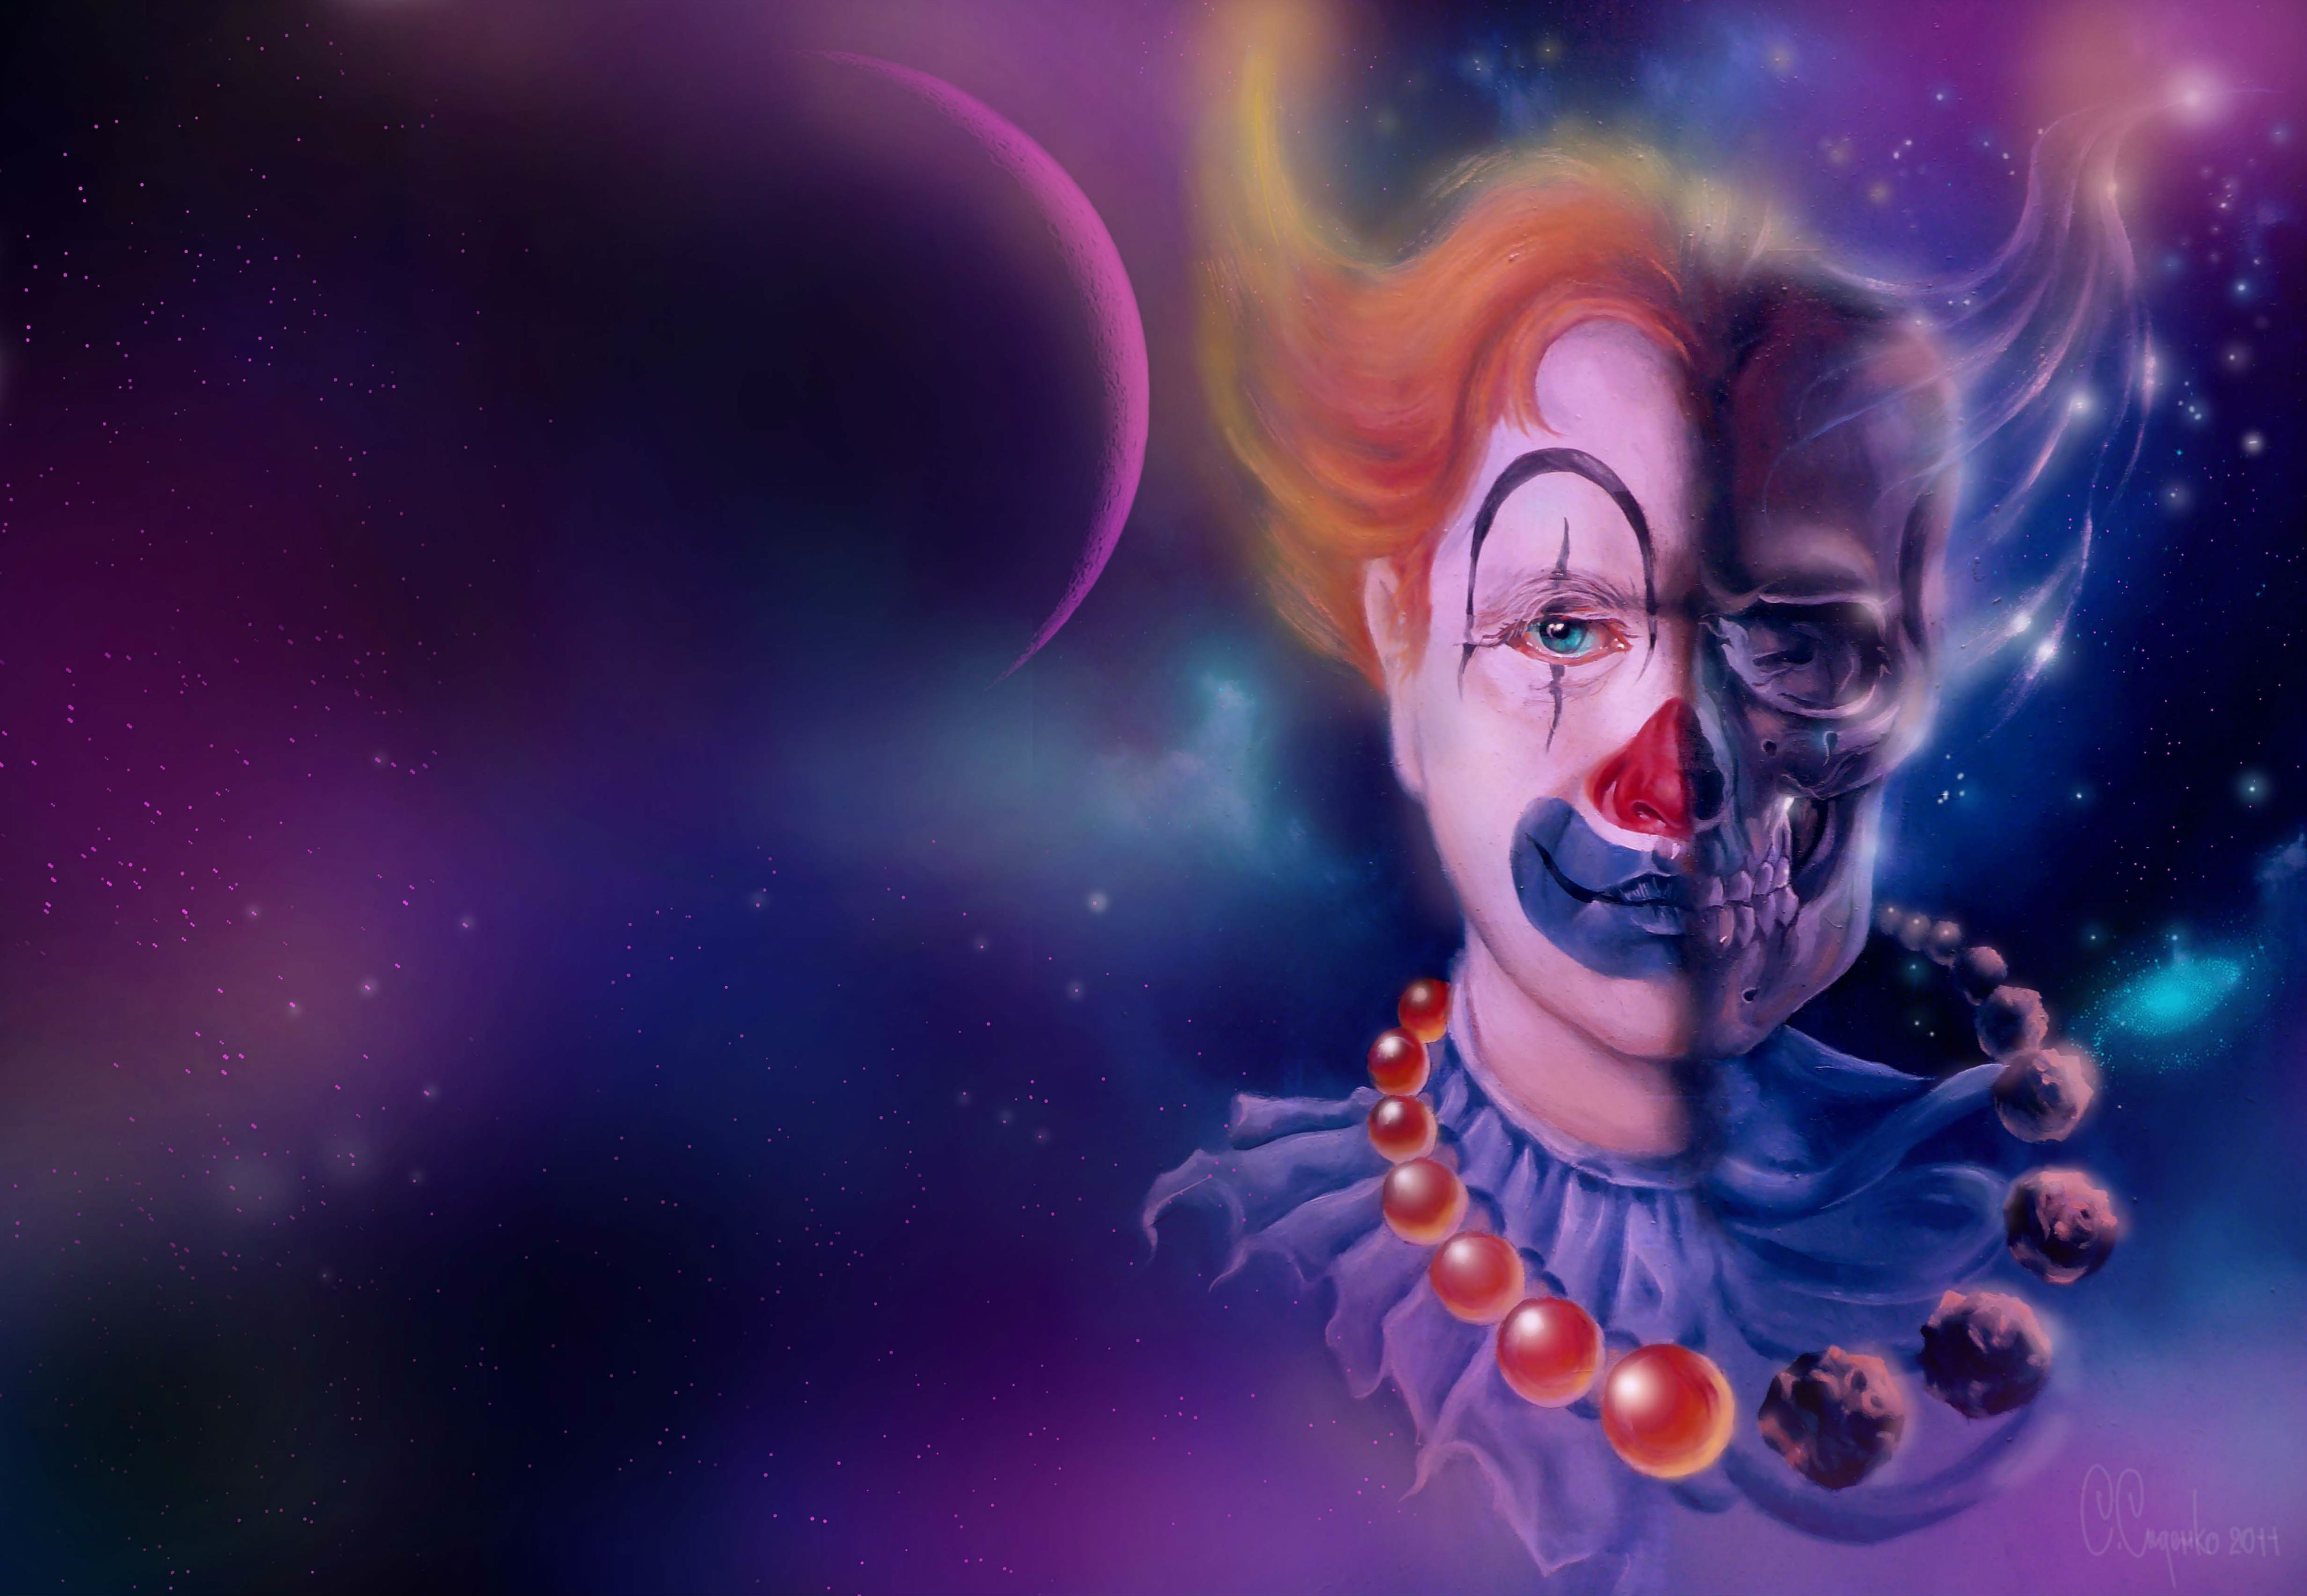 Clown 4k ultra hd wallpaper and background image - Circus joker wallpaper ...